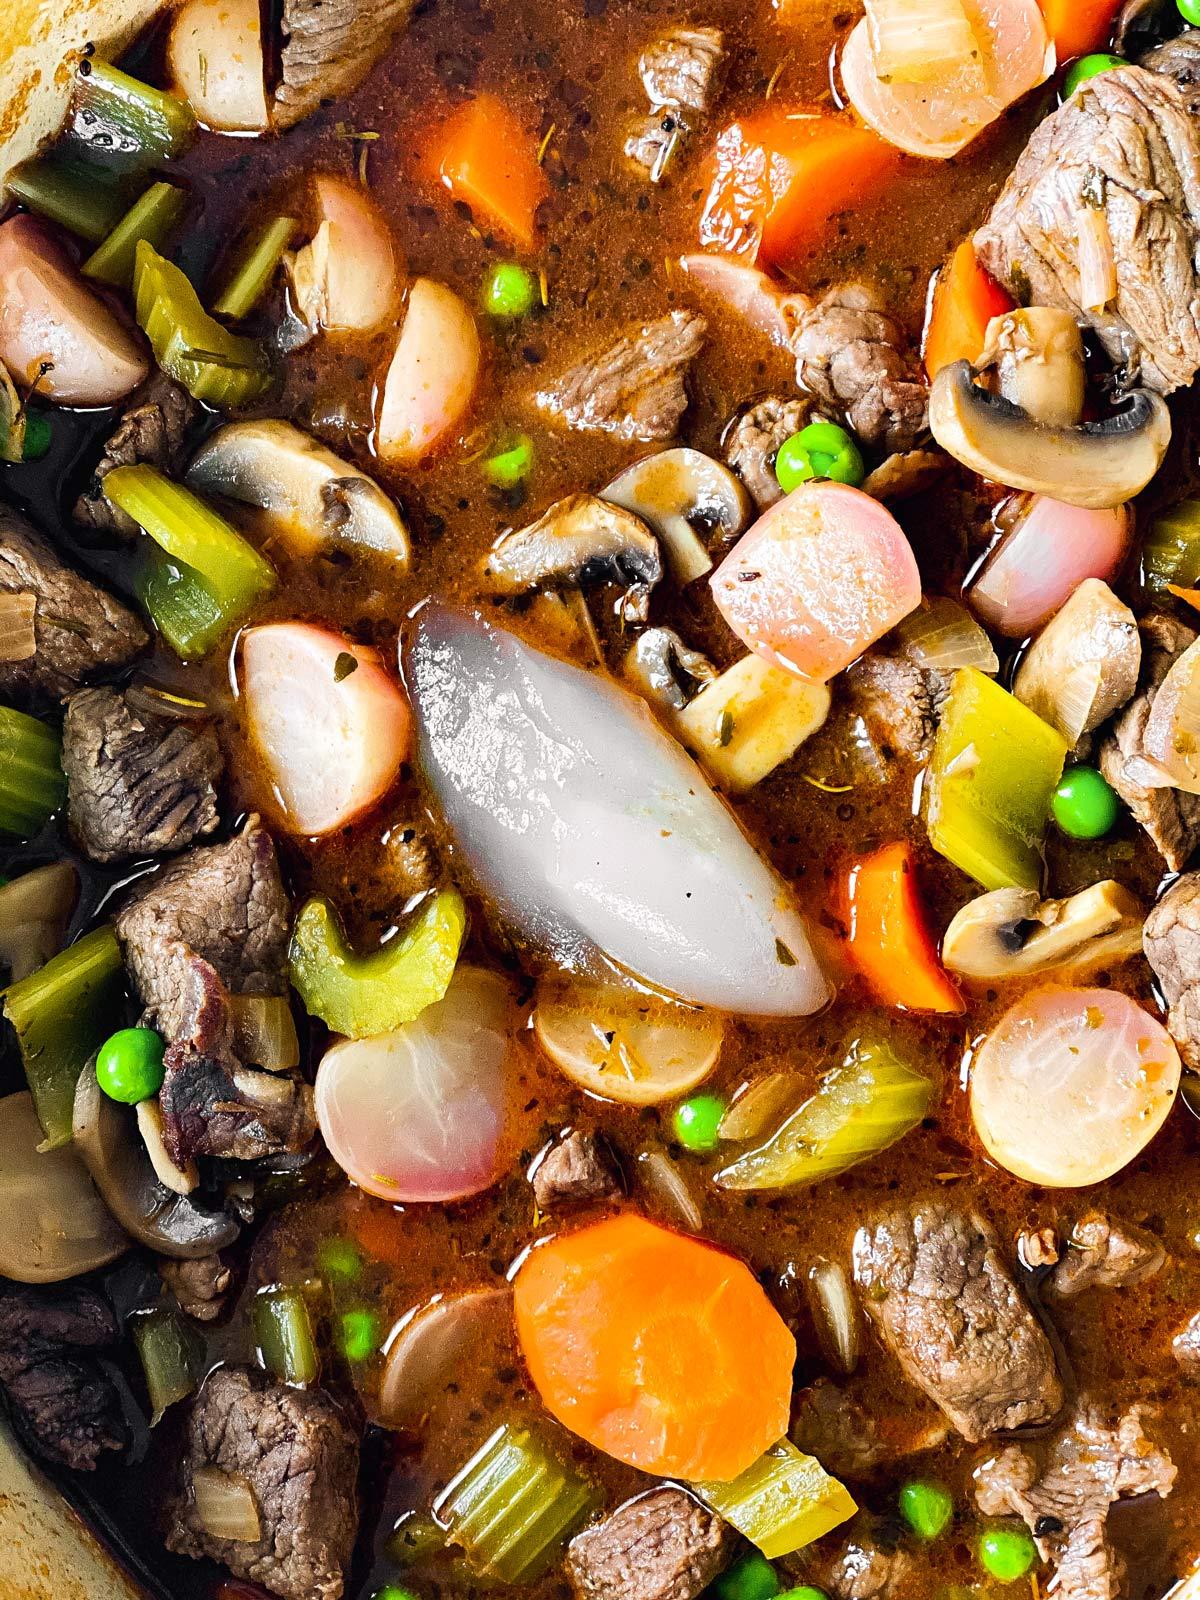 glucomannan pudding in beef stew